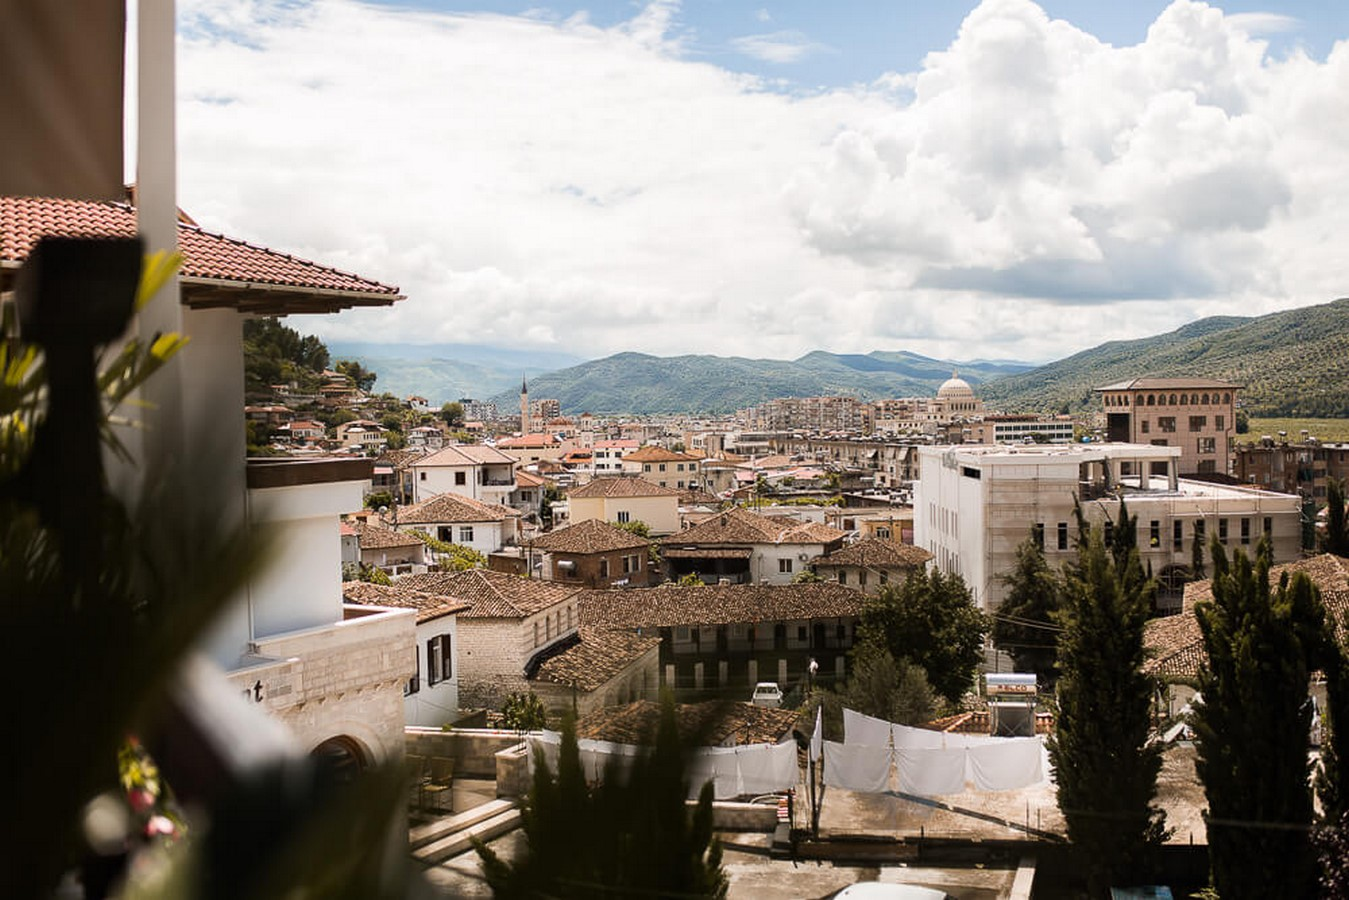 Architecture of Berat and Gjirokastra - Sheet5